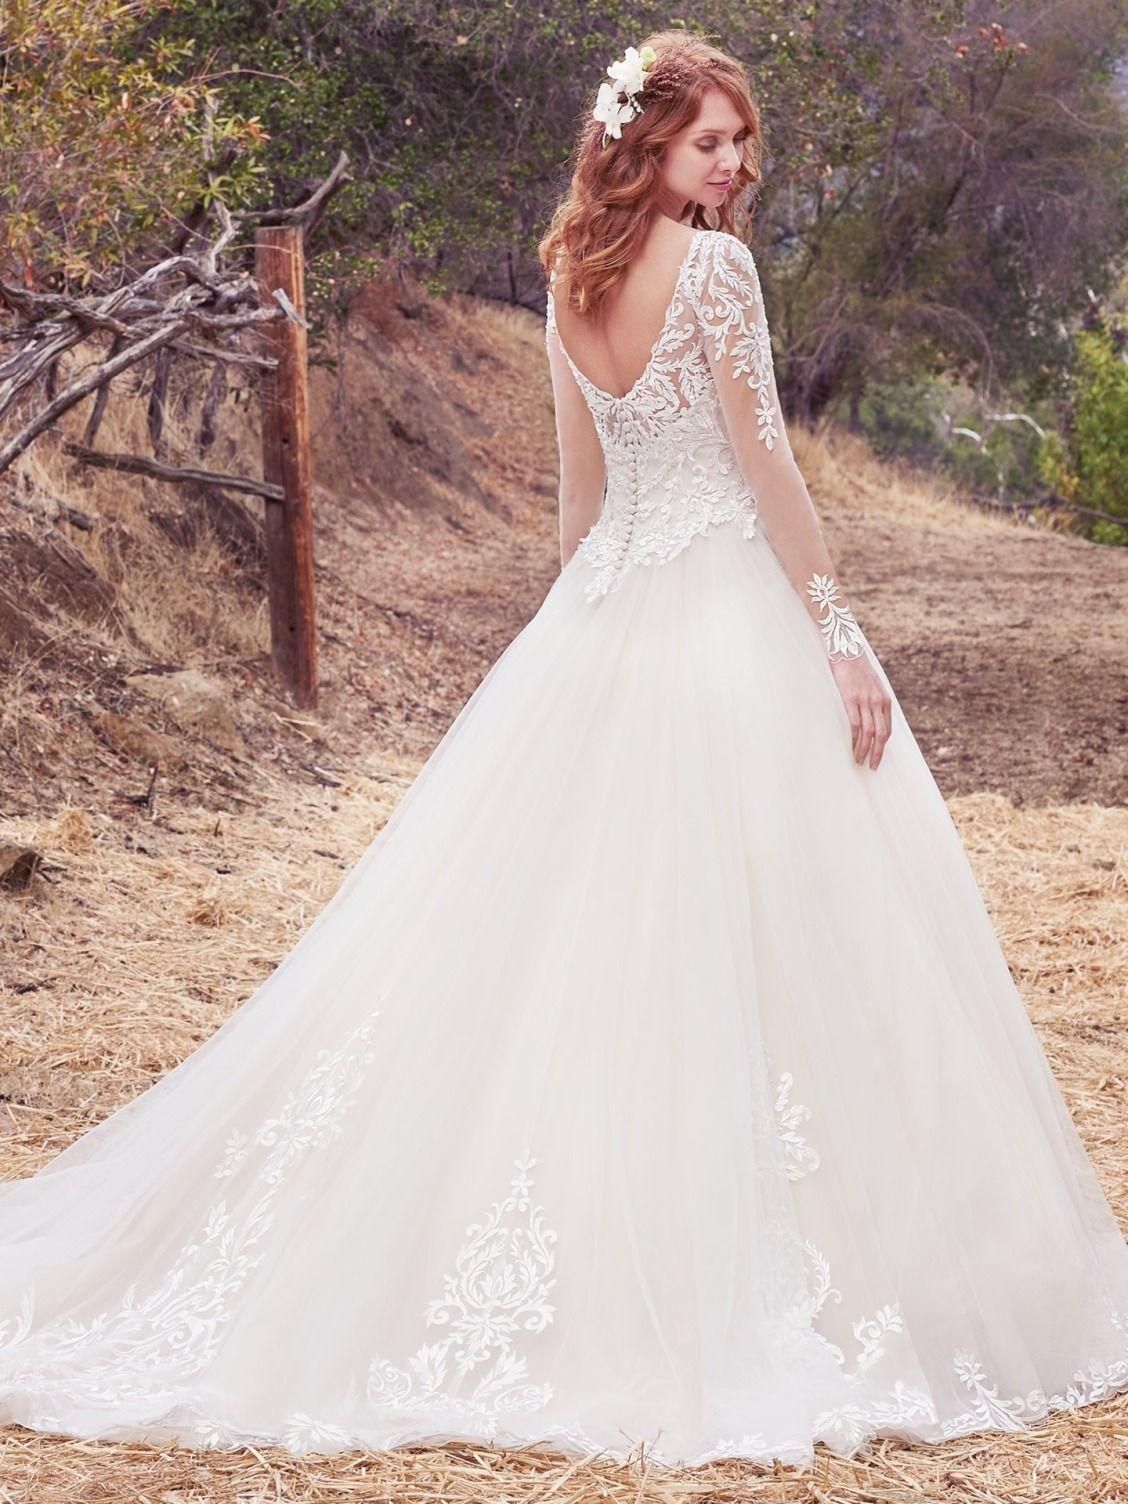 Wedding Dresses & Bridal Gowns   Wedding dresses, Sottero wedding ...